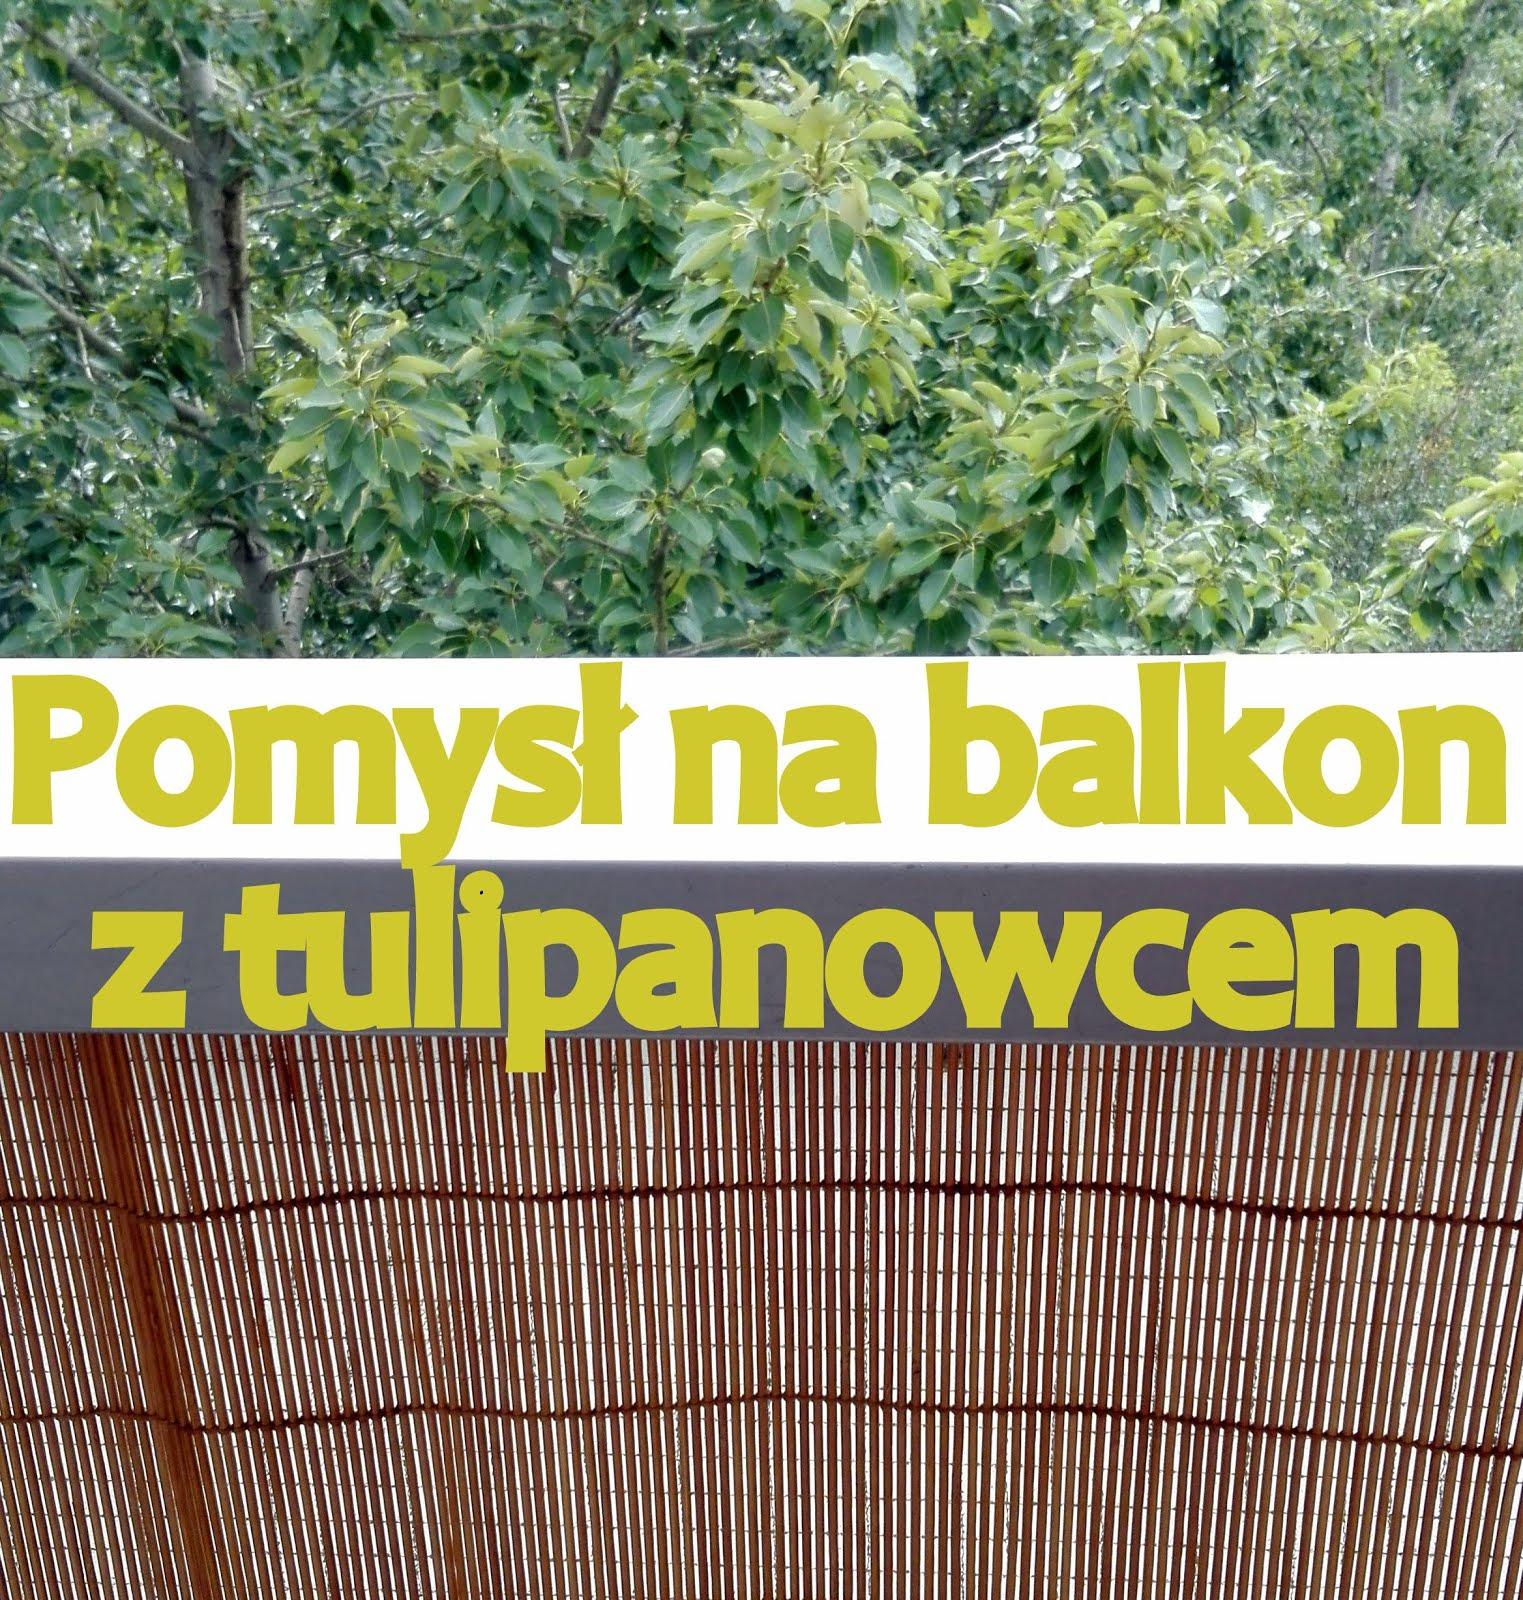 Pomysł na balkon - link party z tulipanowcem